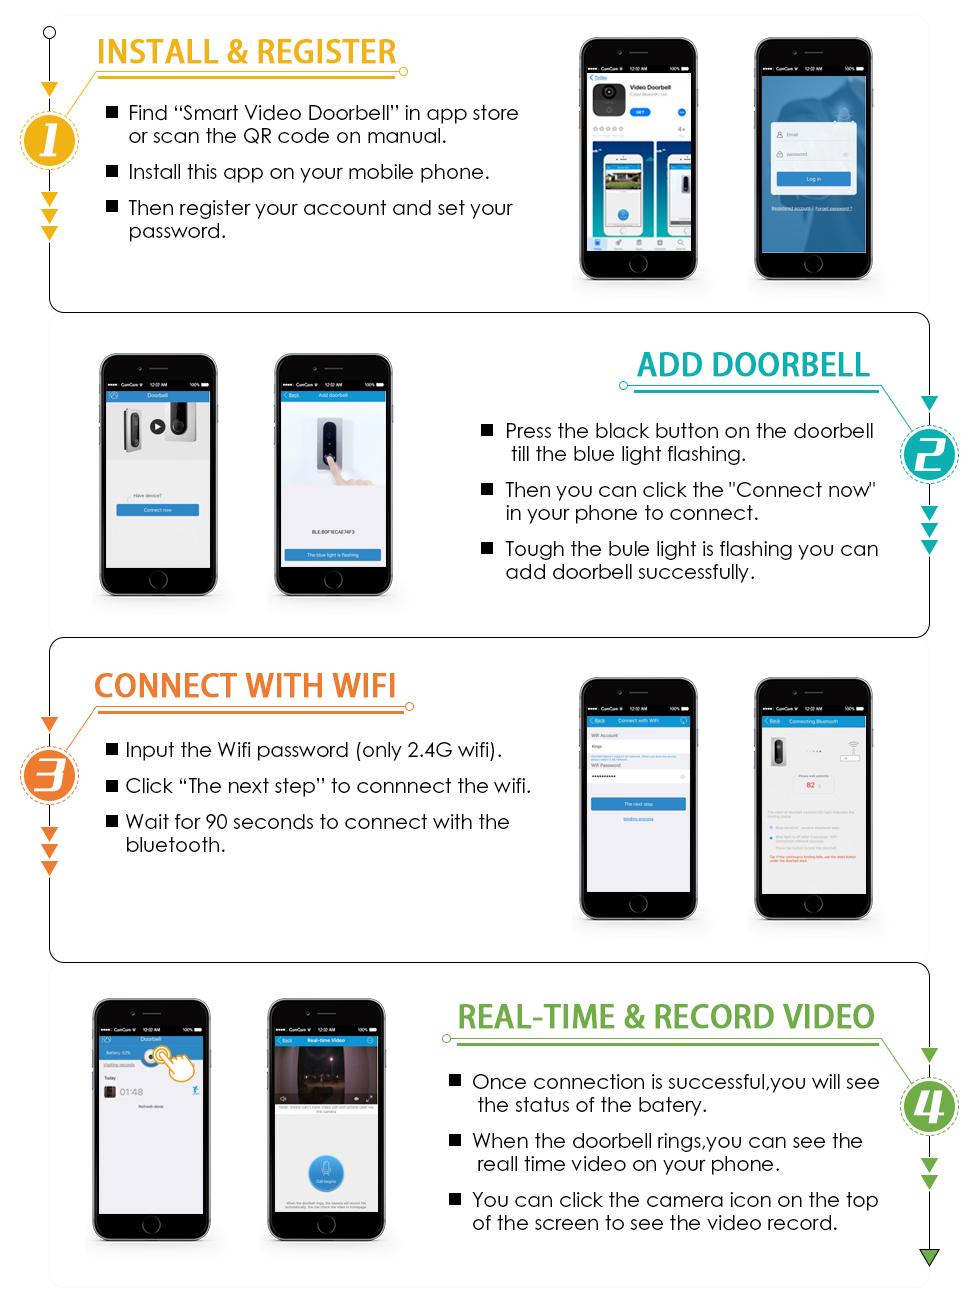 Amazon Wifi Video Doorbell Digoo Sbxya 5 In 1 Ring. Digoo Sbxya 5 In 1 Ring Video Doorbell Wifi Camera. Wiring. Of Diagram Doorbell A Wiring Wl 4a At Scoala.co